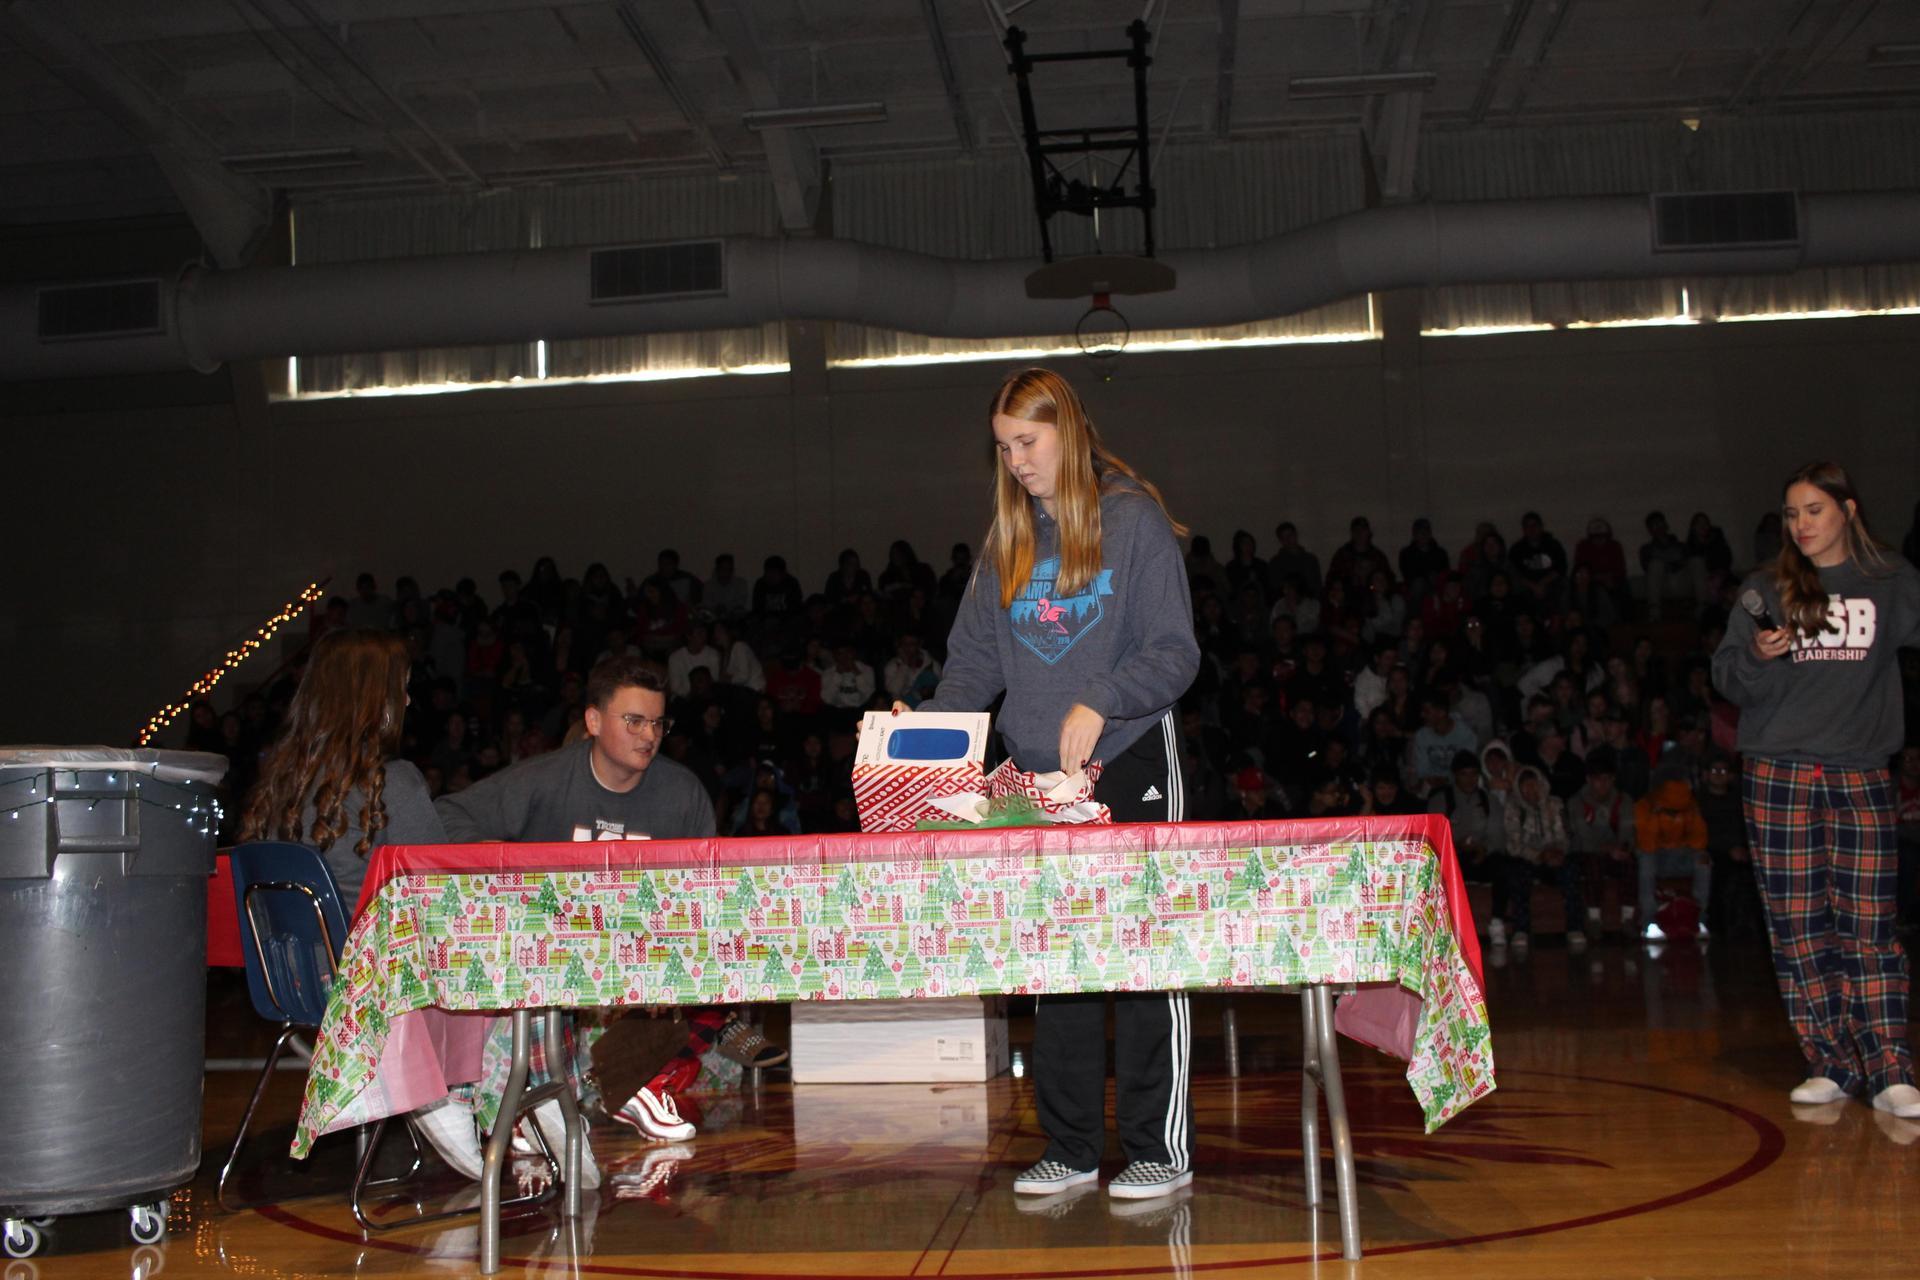 Zoe Bitter opening her gift